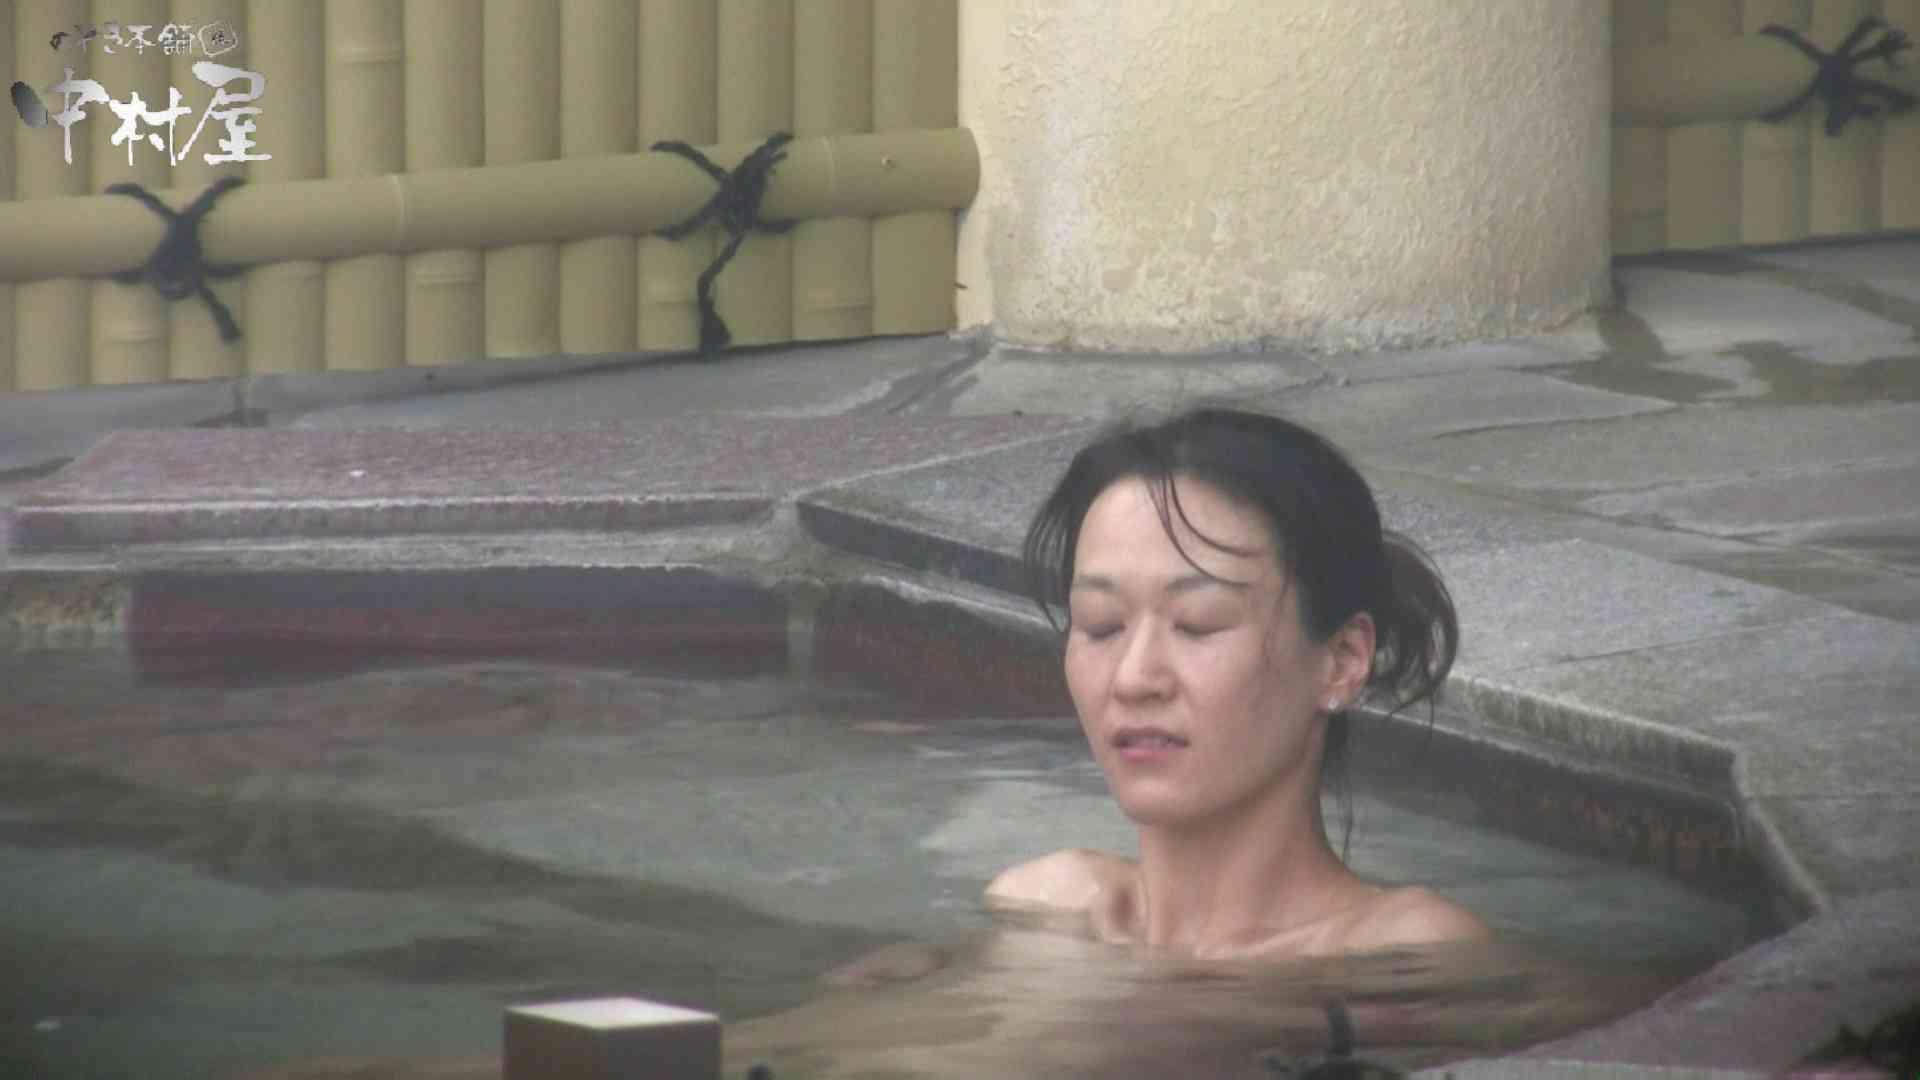 Aquaな露天風呂Vol.928 OLセックス  99画像 6